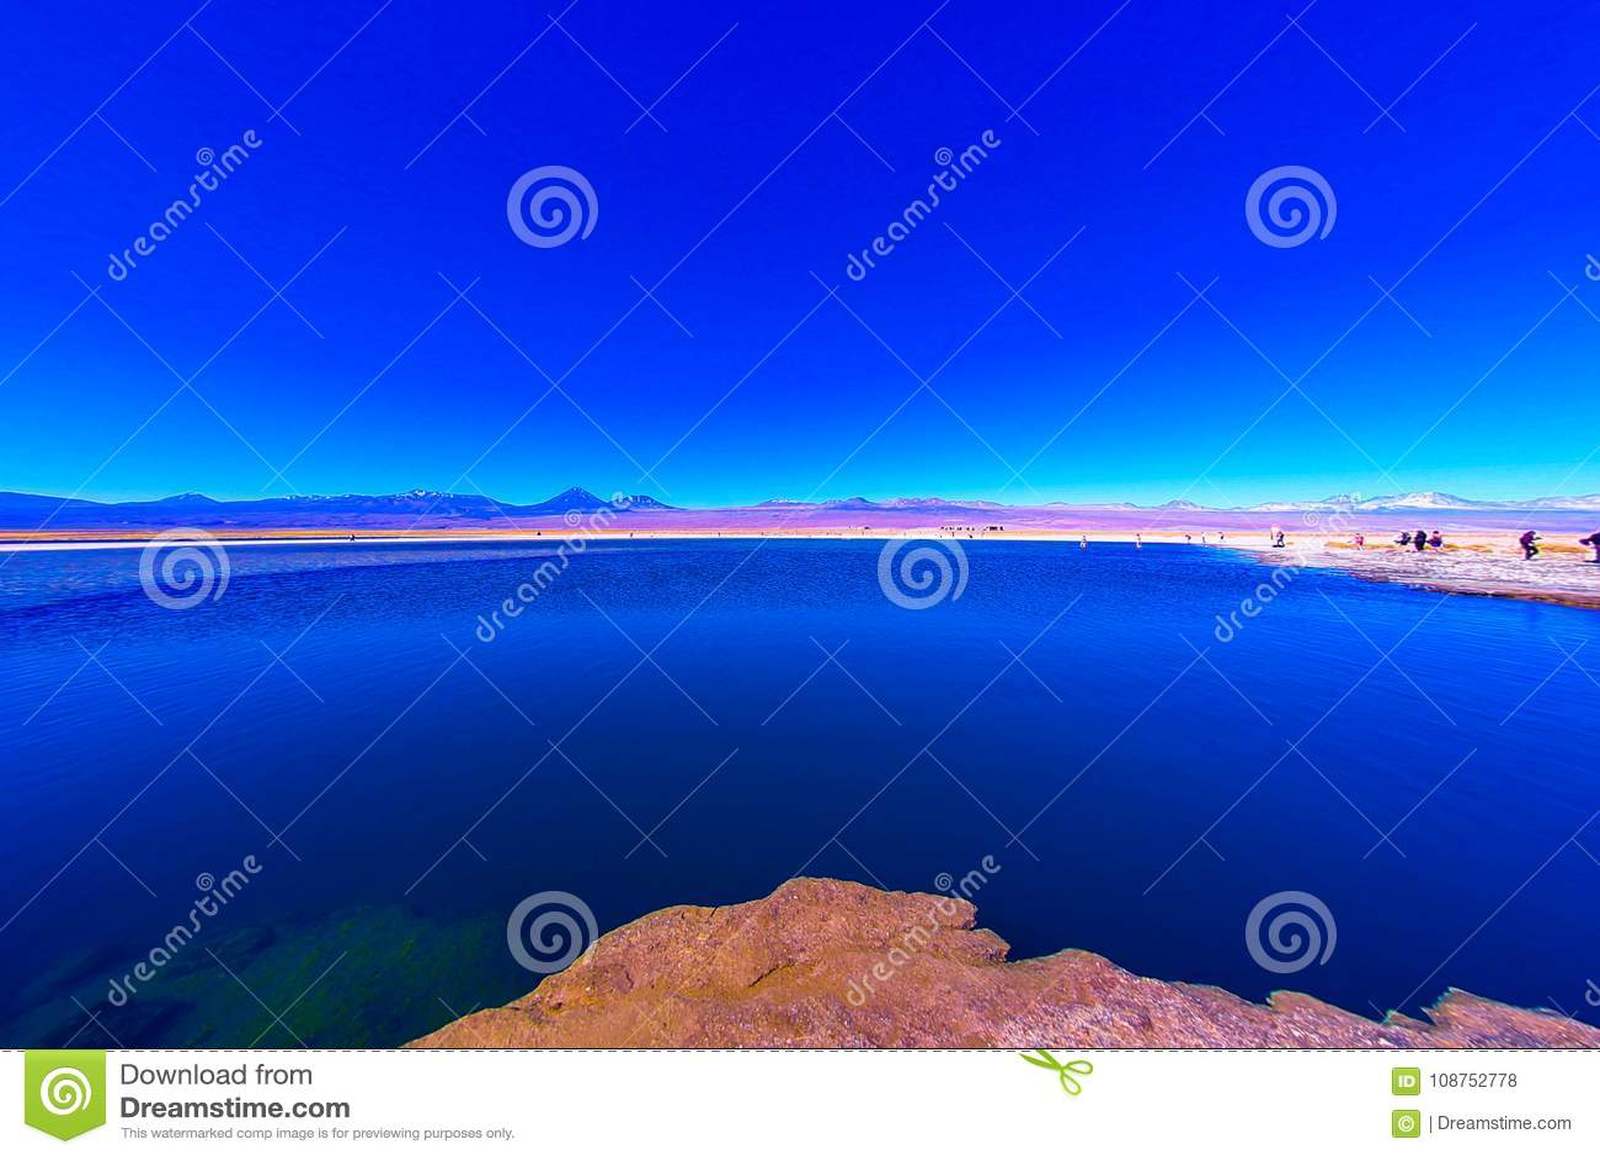 CEJAR LAGOON. Laguna Cejar. Cejar Lake.